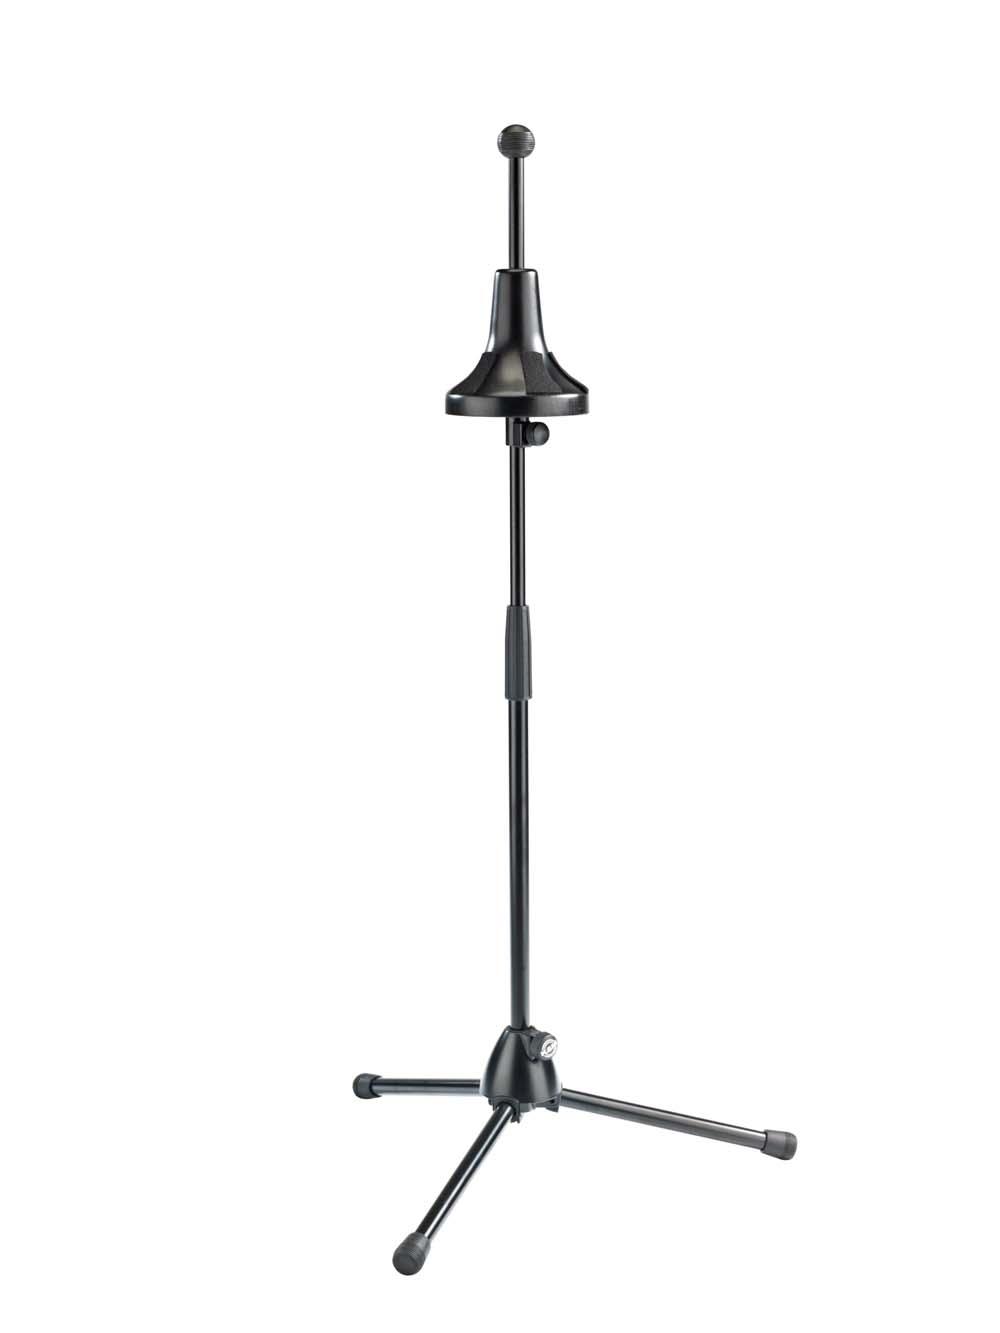 KM 149/1 Bass Trombone stand